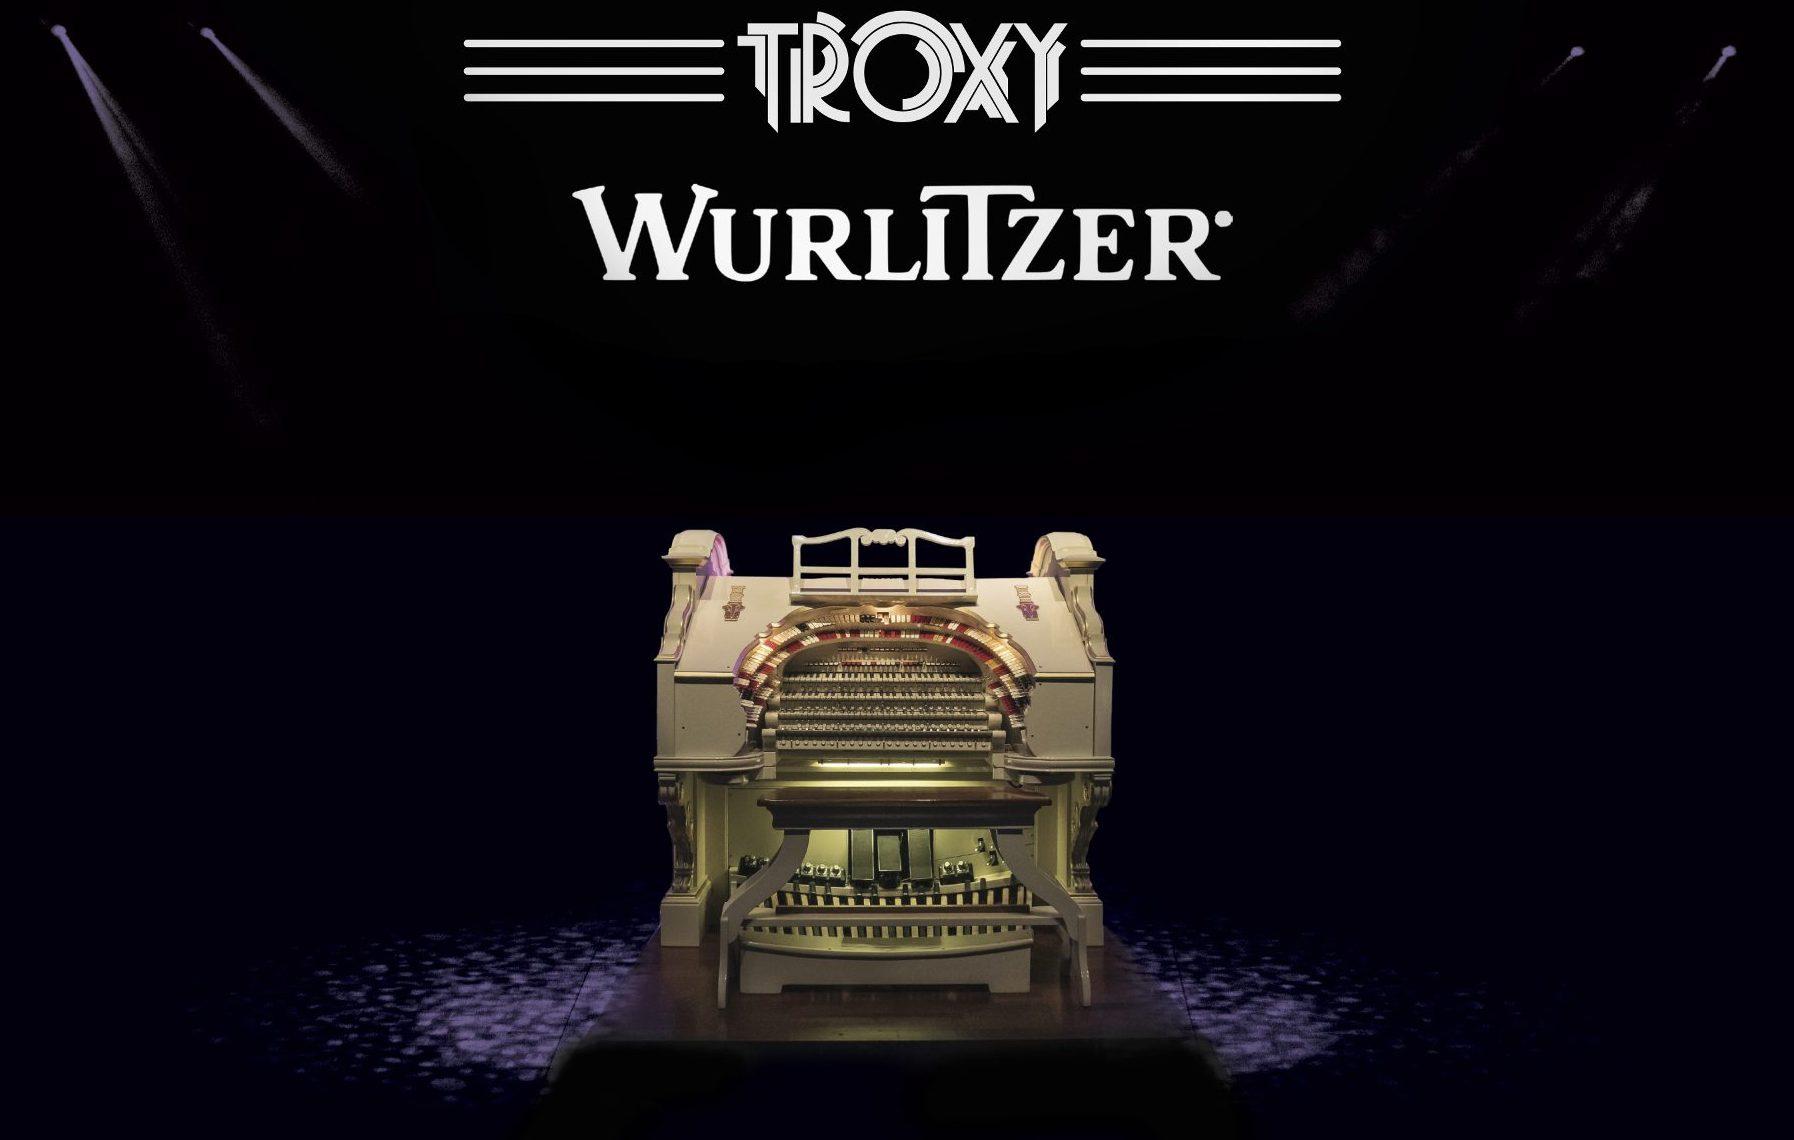 Troxy Wurlitzer